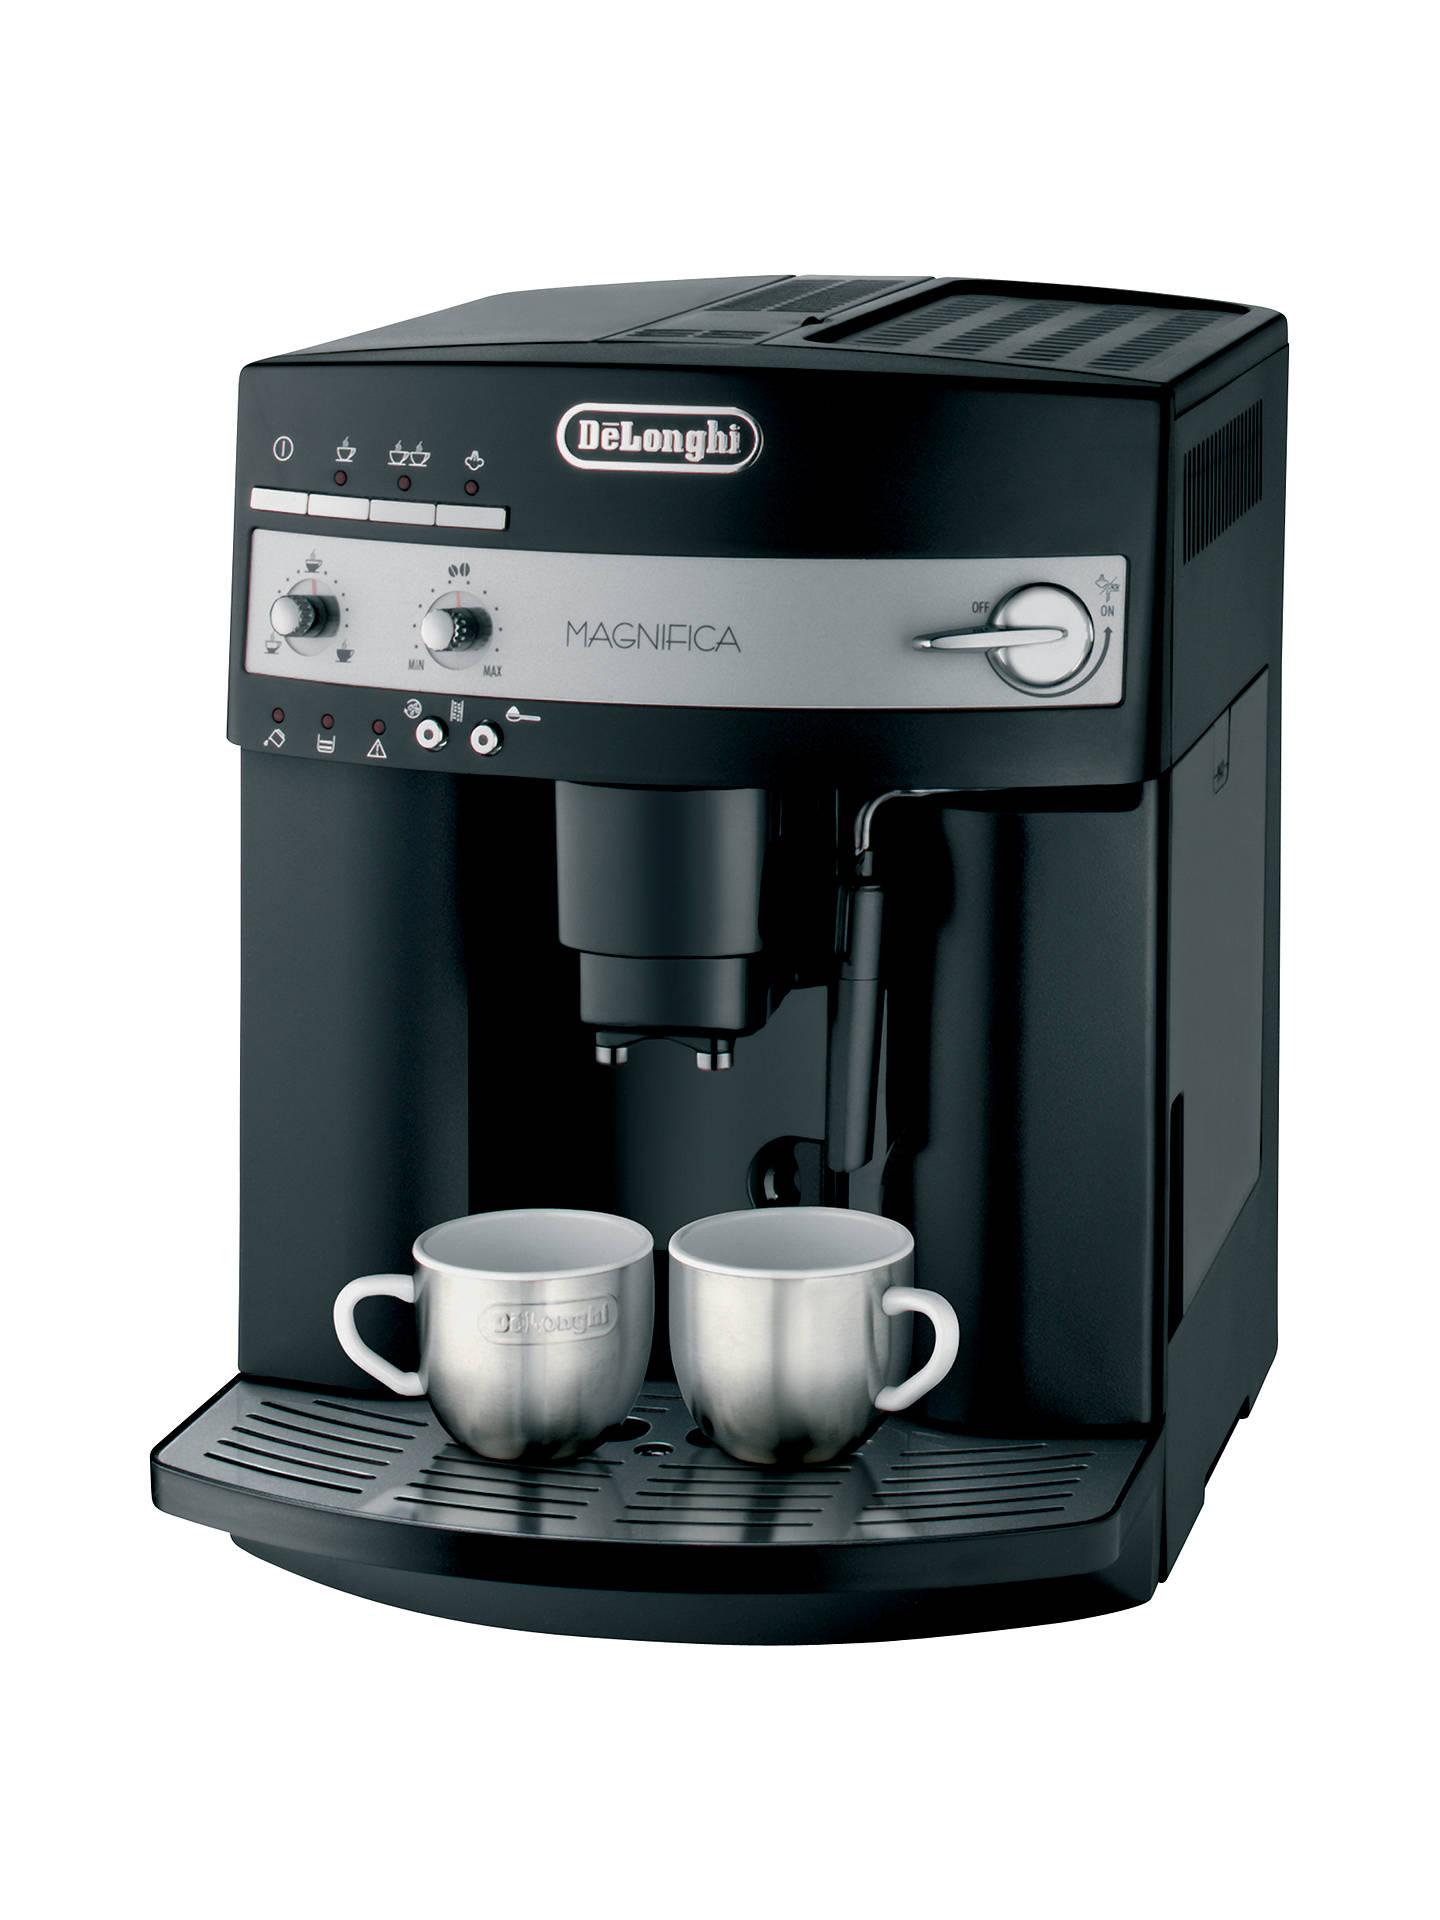 delonghi coffee machine instructions magnifica